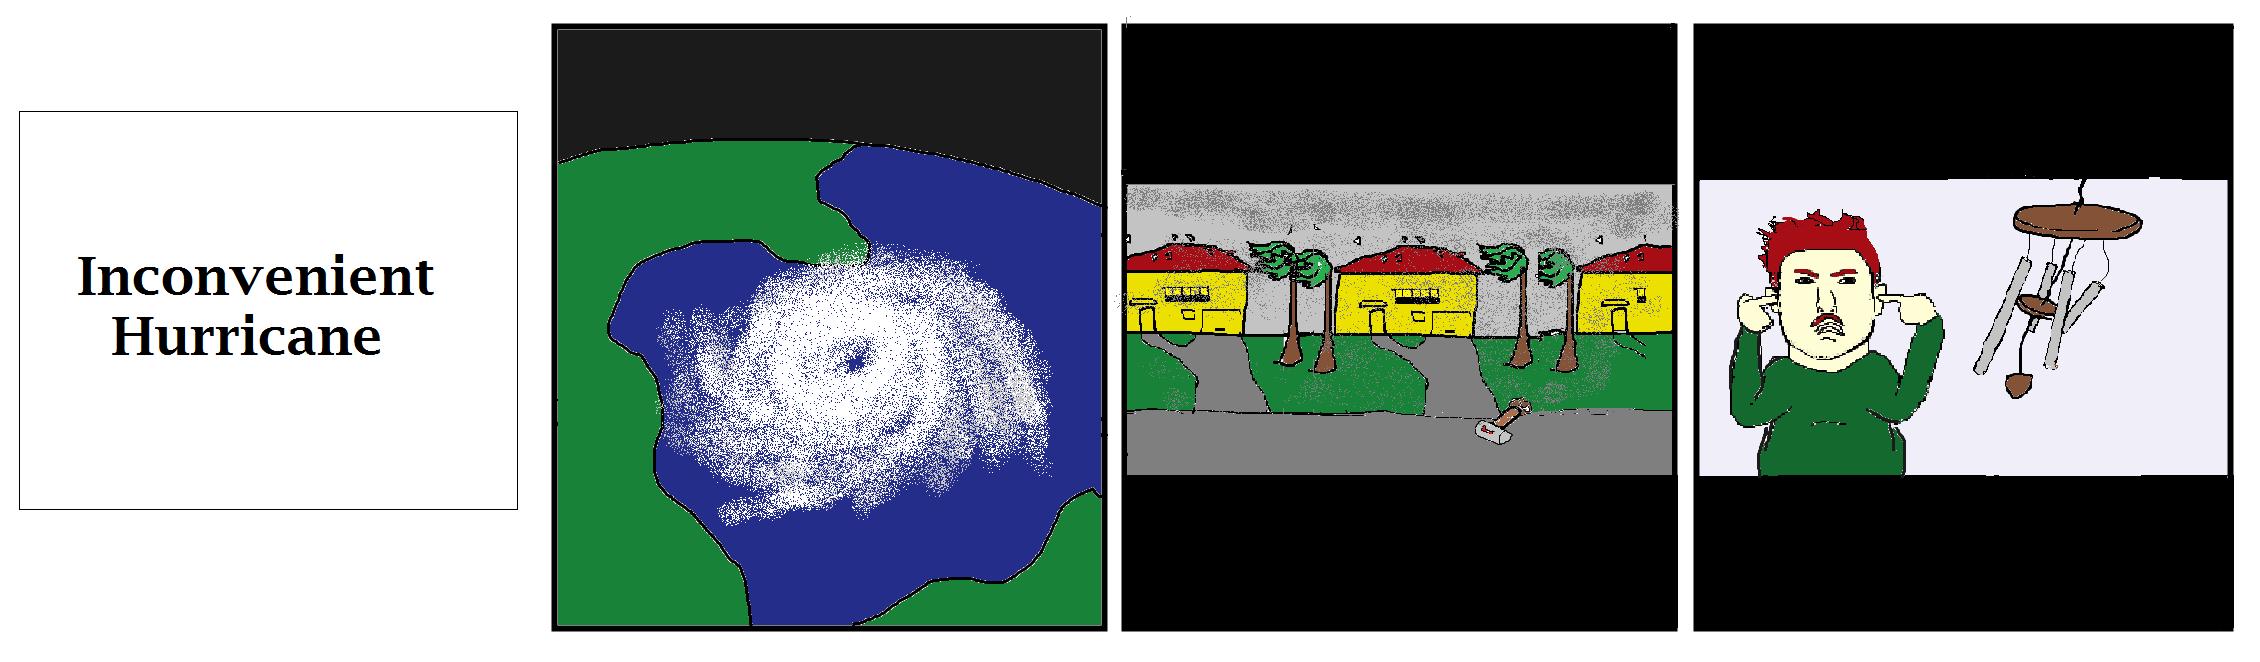 hurricane8.png